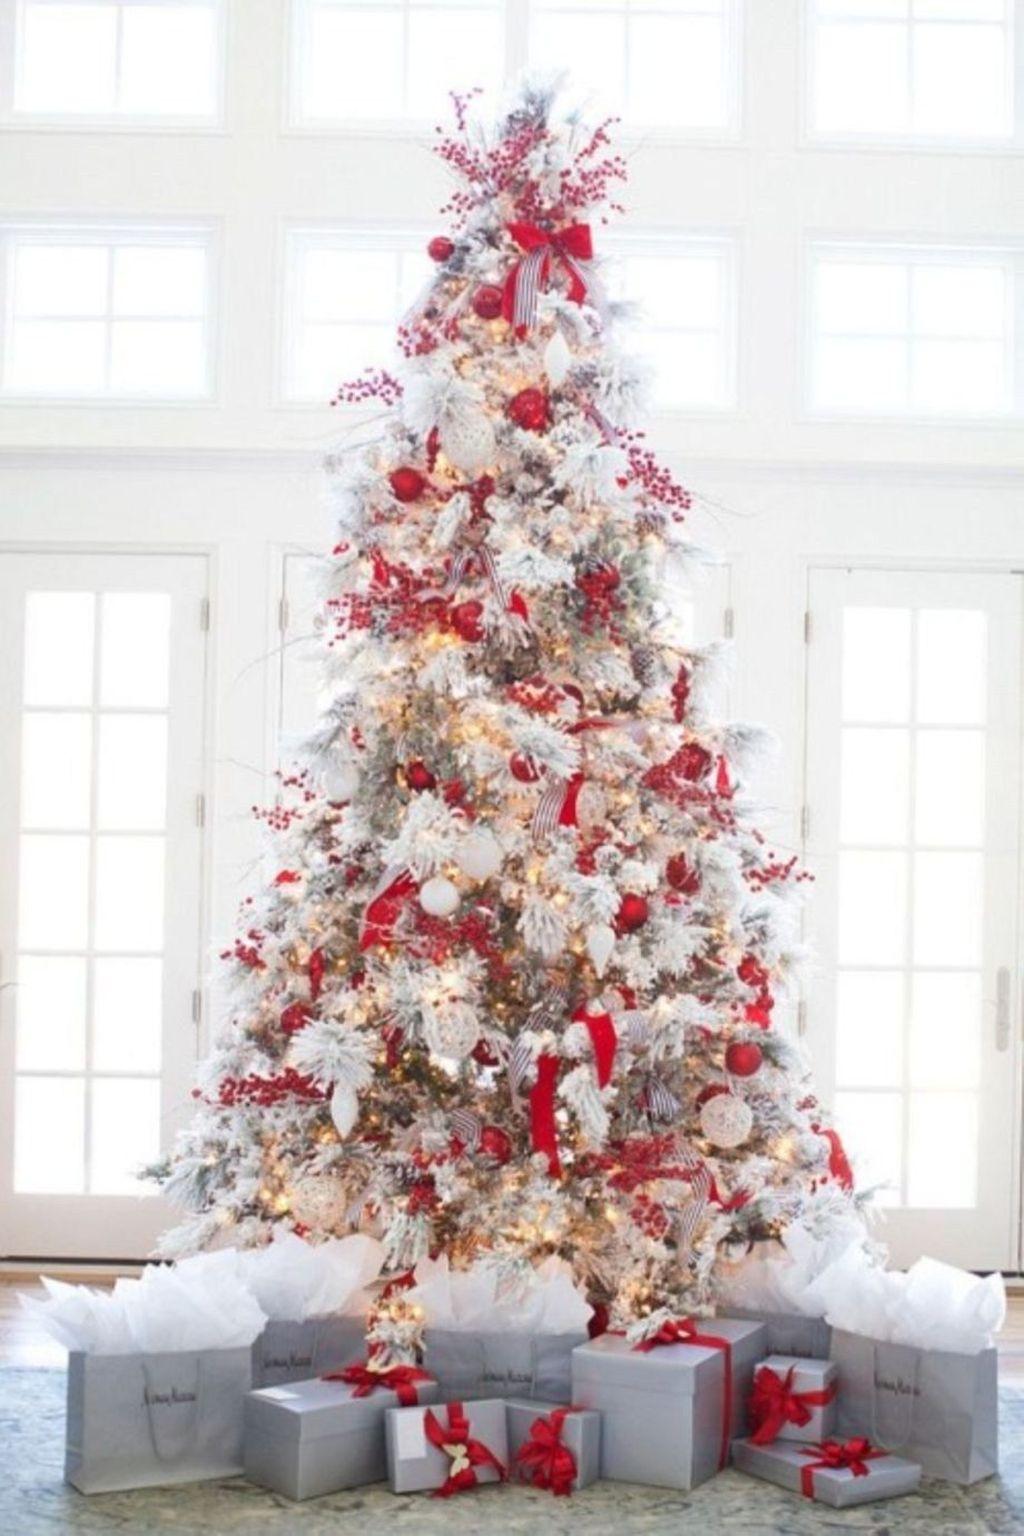 Amazing Winter Christmas Tree Design And Decor Ideas 15